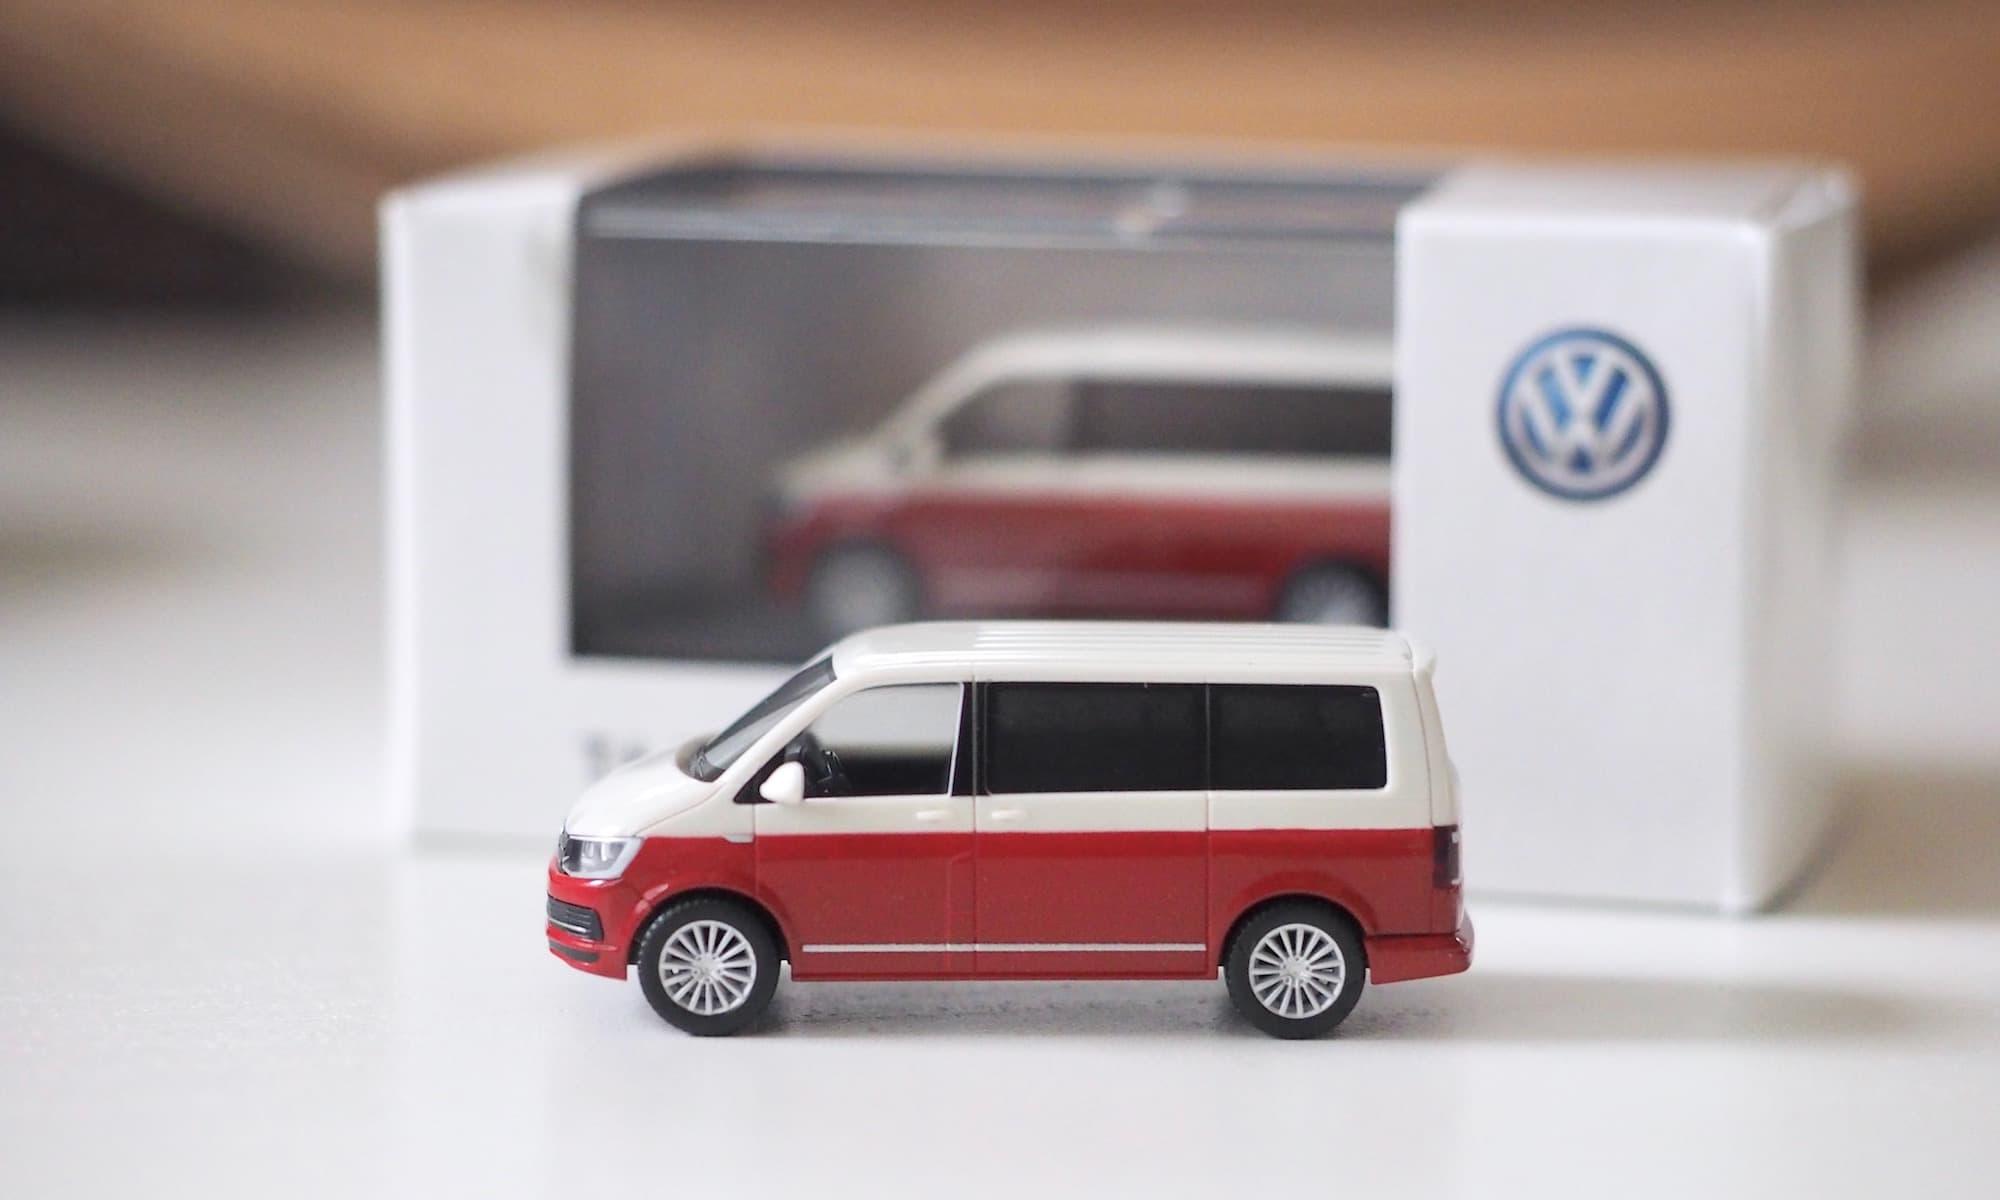 Das VW T6 Herpa 1:87 Modellauto | Foto: BulliT6.de